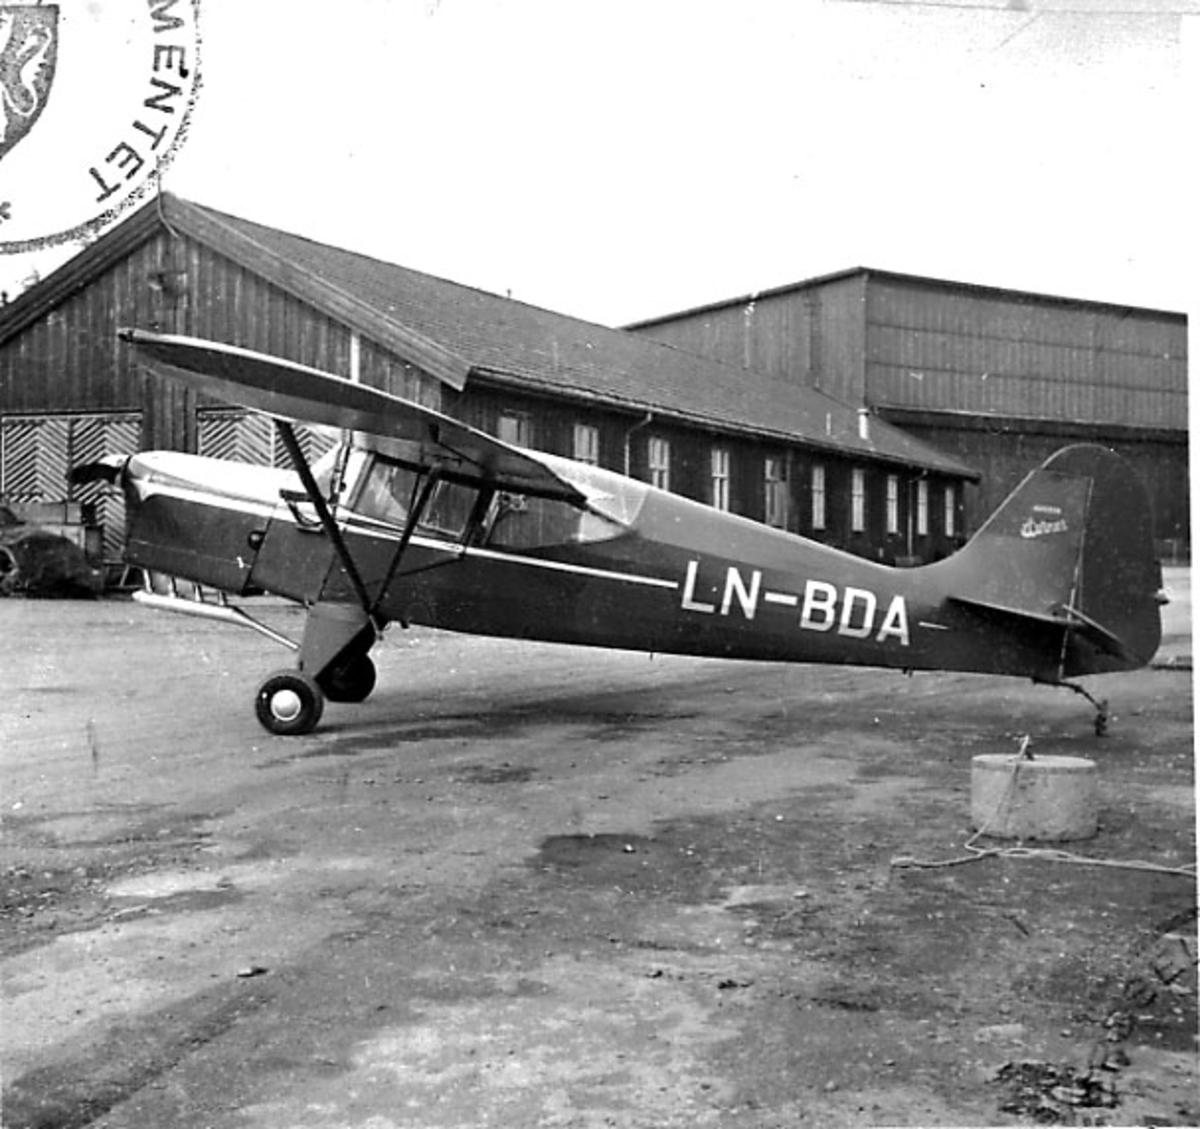 Lufthavn, 1 fly på bakken, Auster J.5 G, LN-BDA, fra A/S Norrønafly. Bygninger bak.